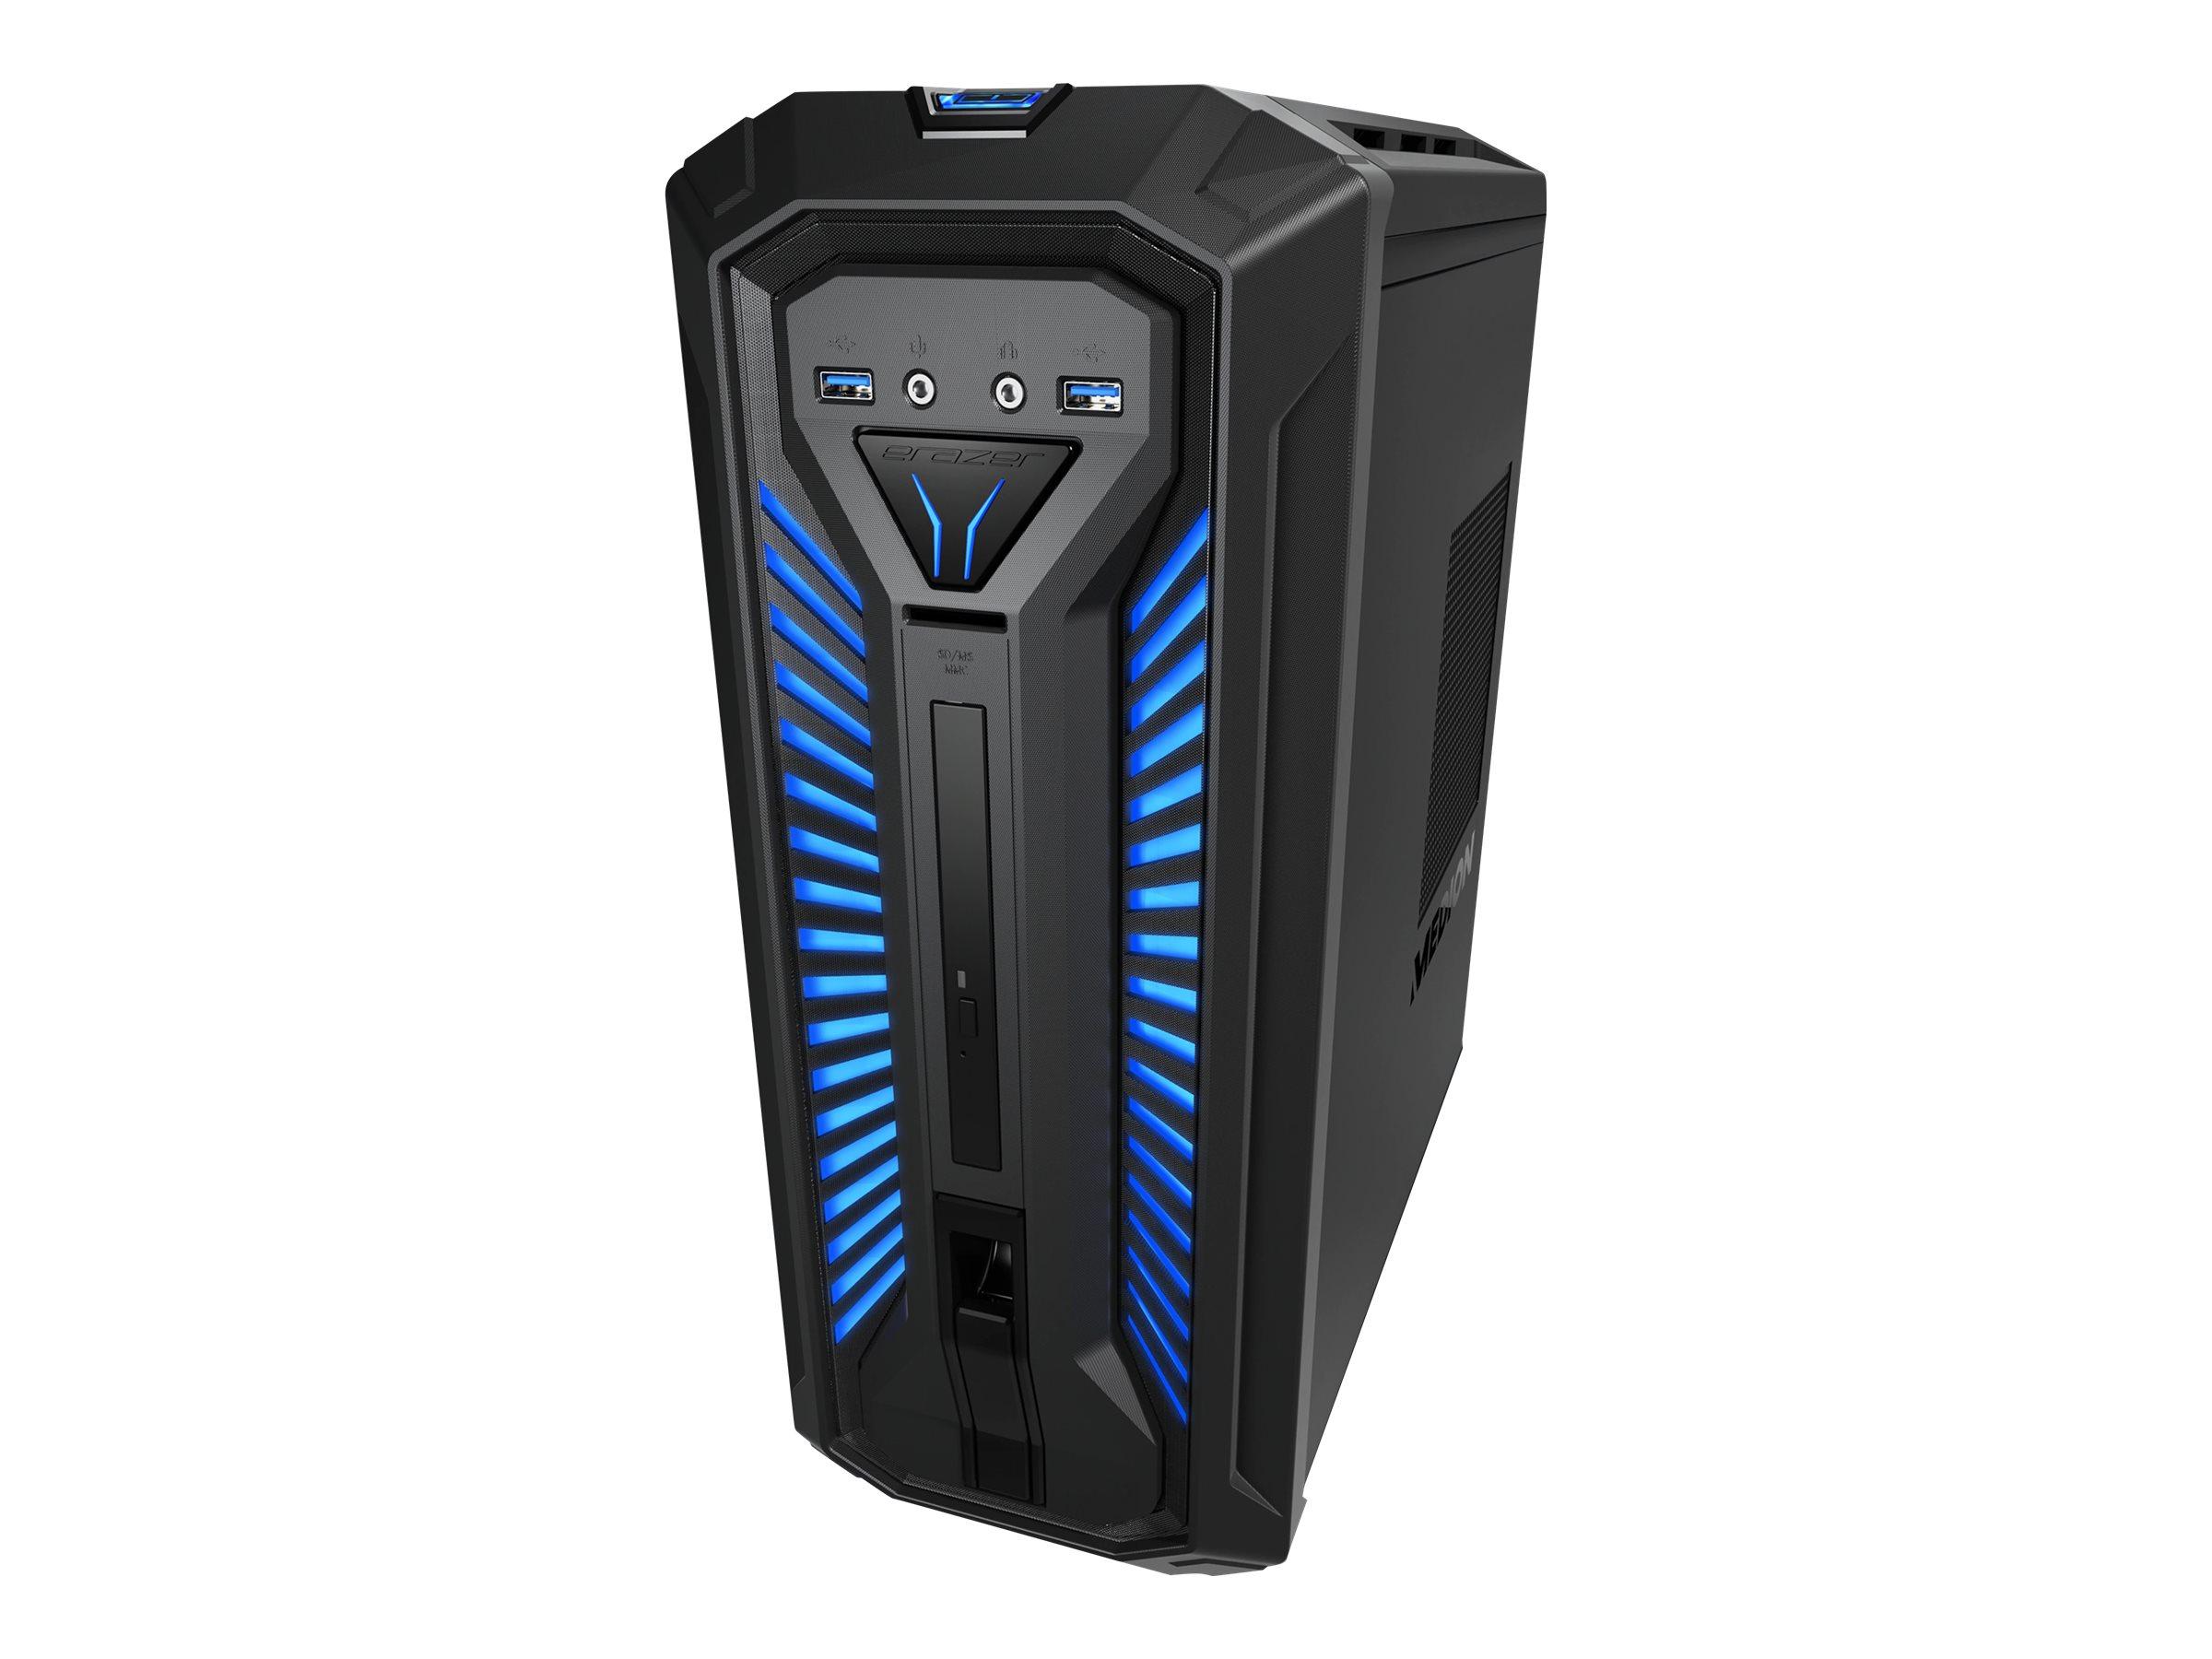 Medion ERAZER X67053 - Tower - 1 x Core i5 8400 / 2.8 GHz - RAM 16 GB - SSD 256 GB, HDD 1 TB - DVD-Writer